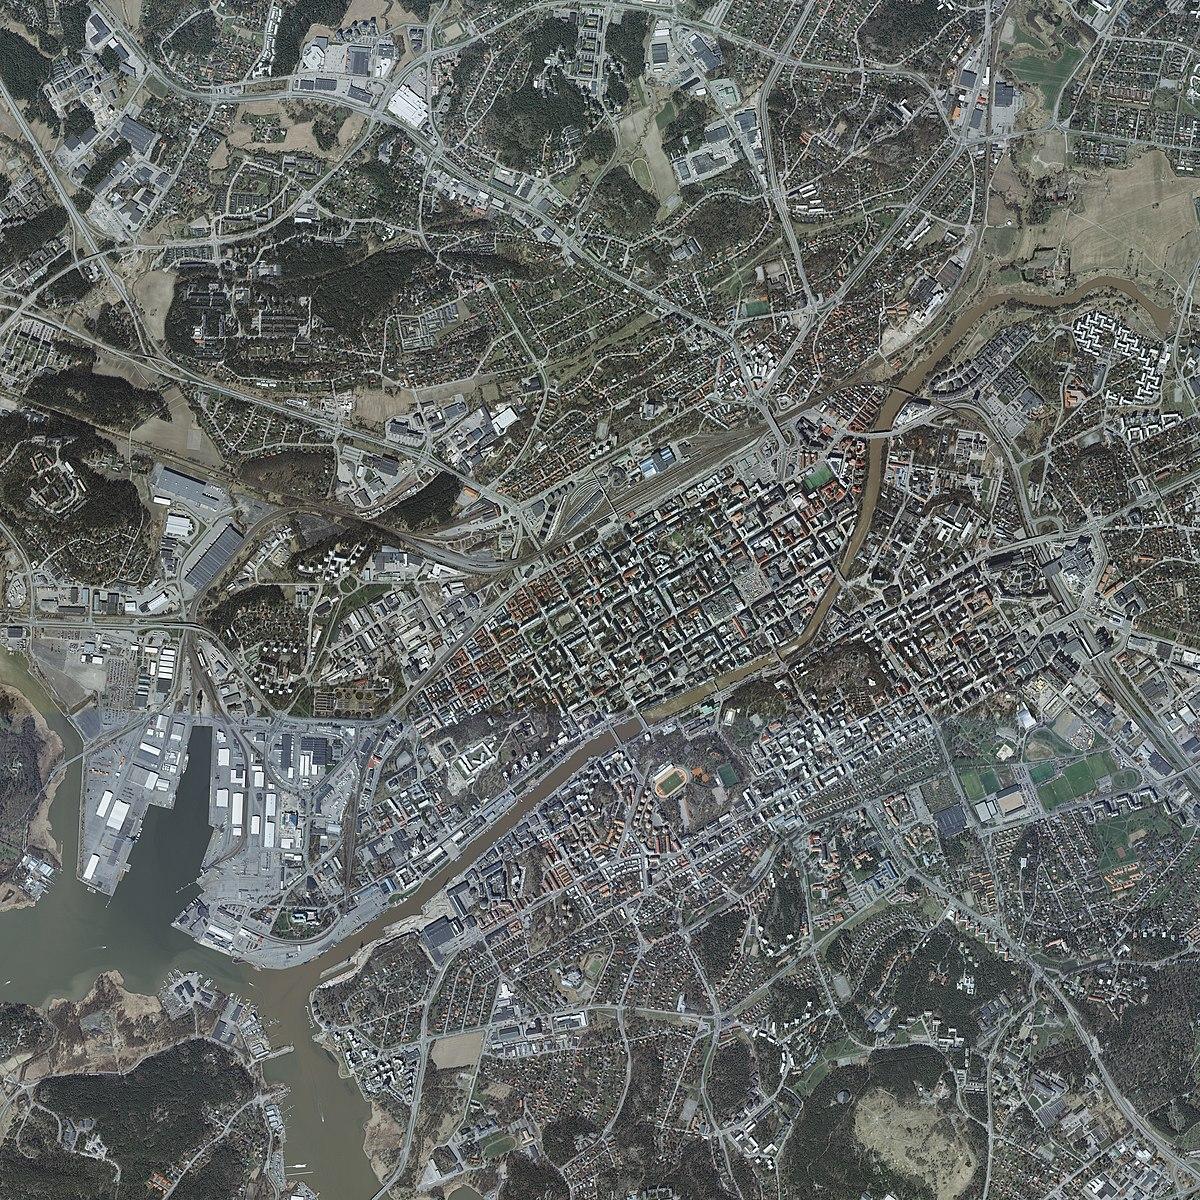 File Turku Orthoilmakuva Jpg Wikimedia Commons